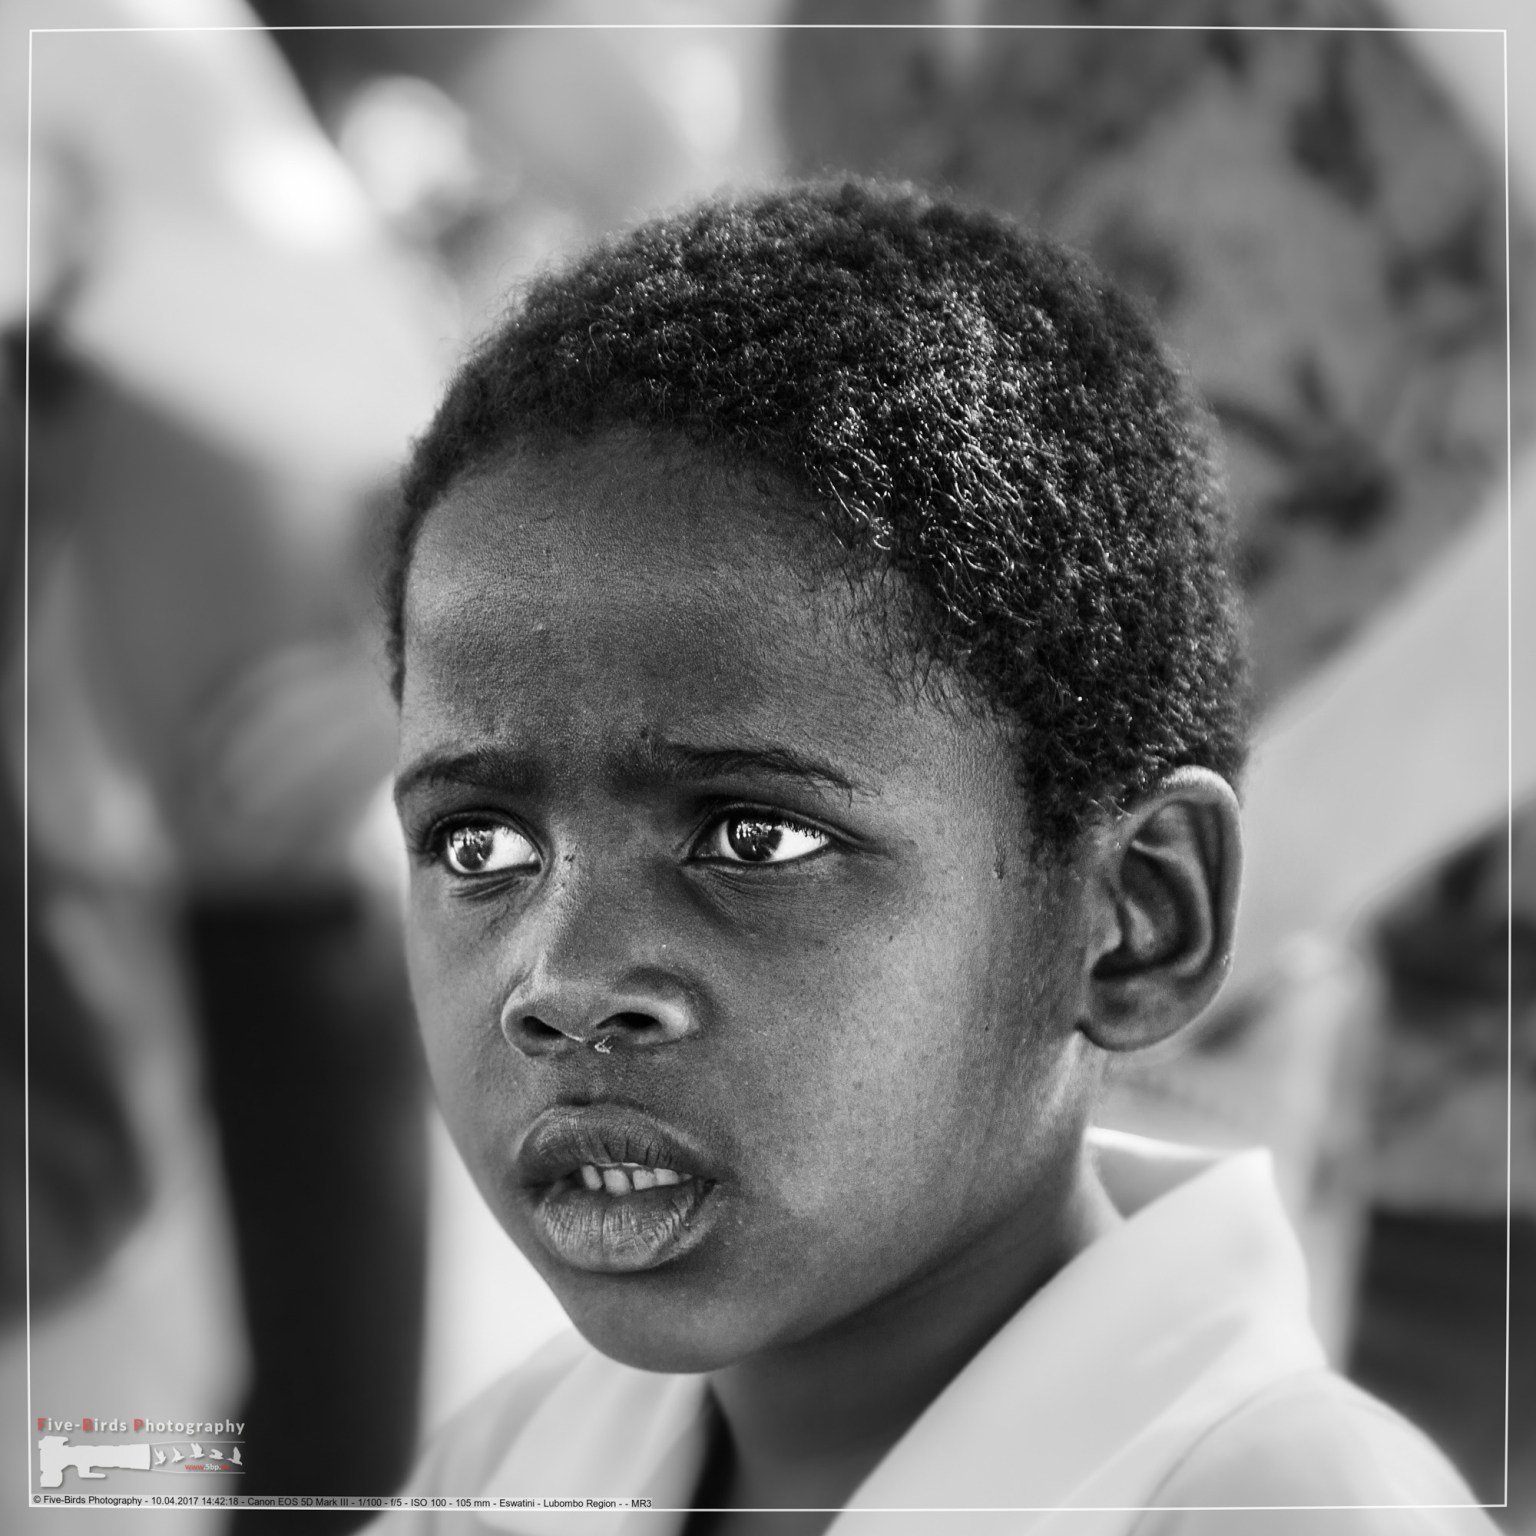 Schulkind in Swaziland (heute Eswatini)